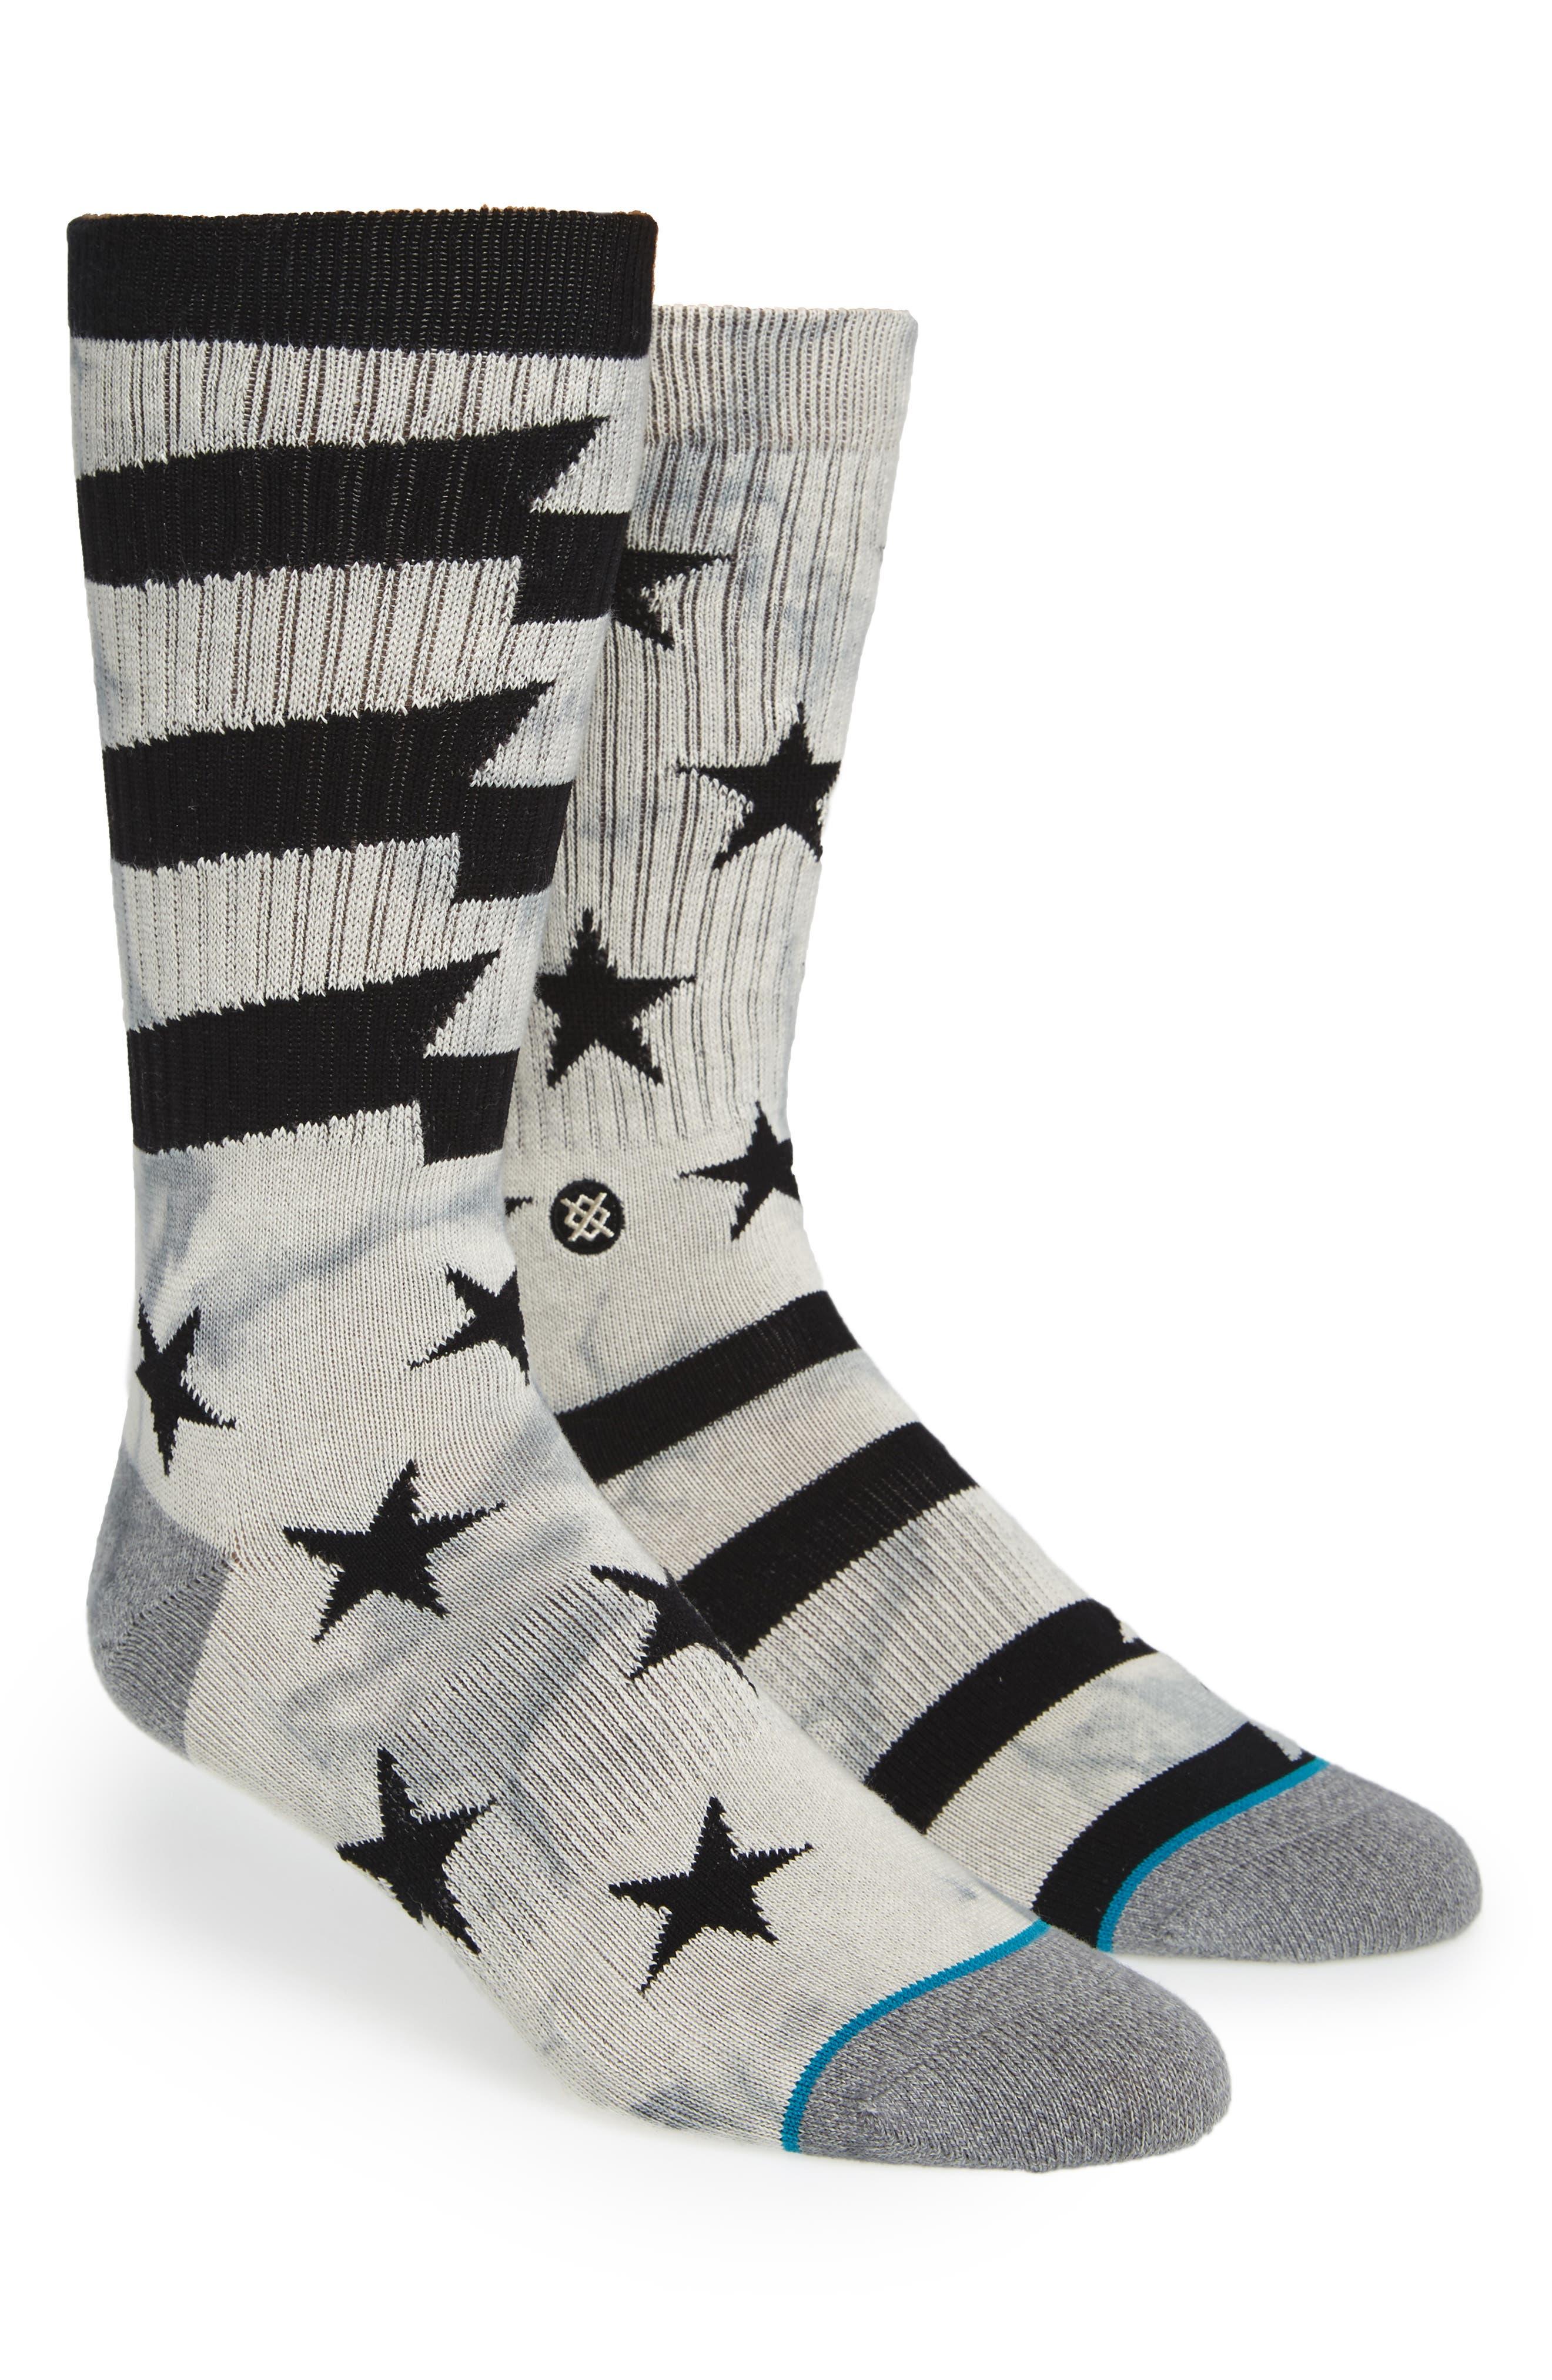 Sidereal Crew Socks,                             Main thumbnail 1, color,                             030